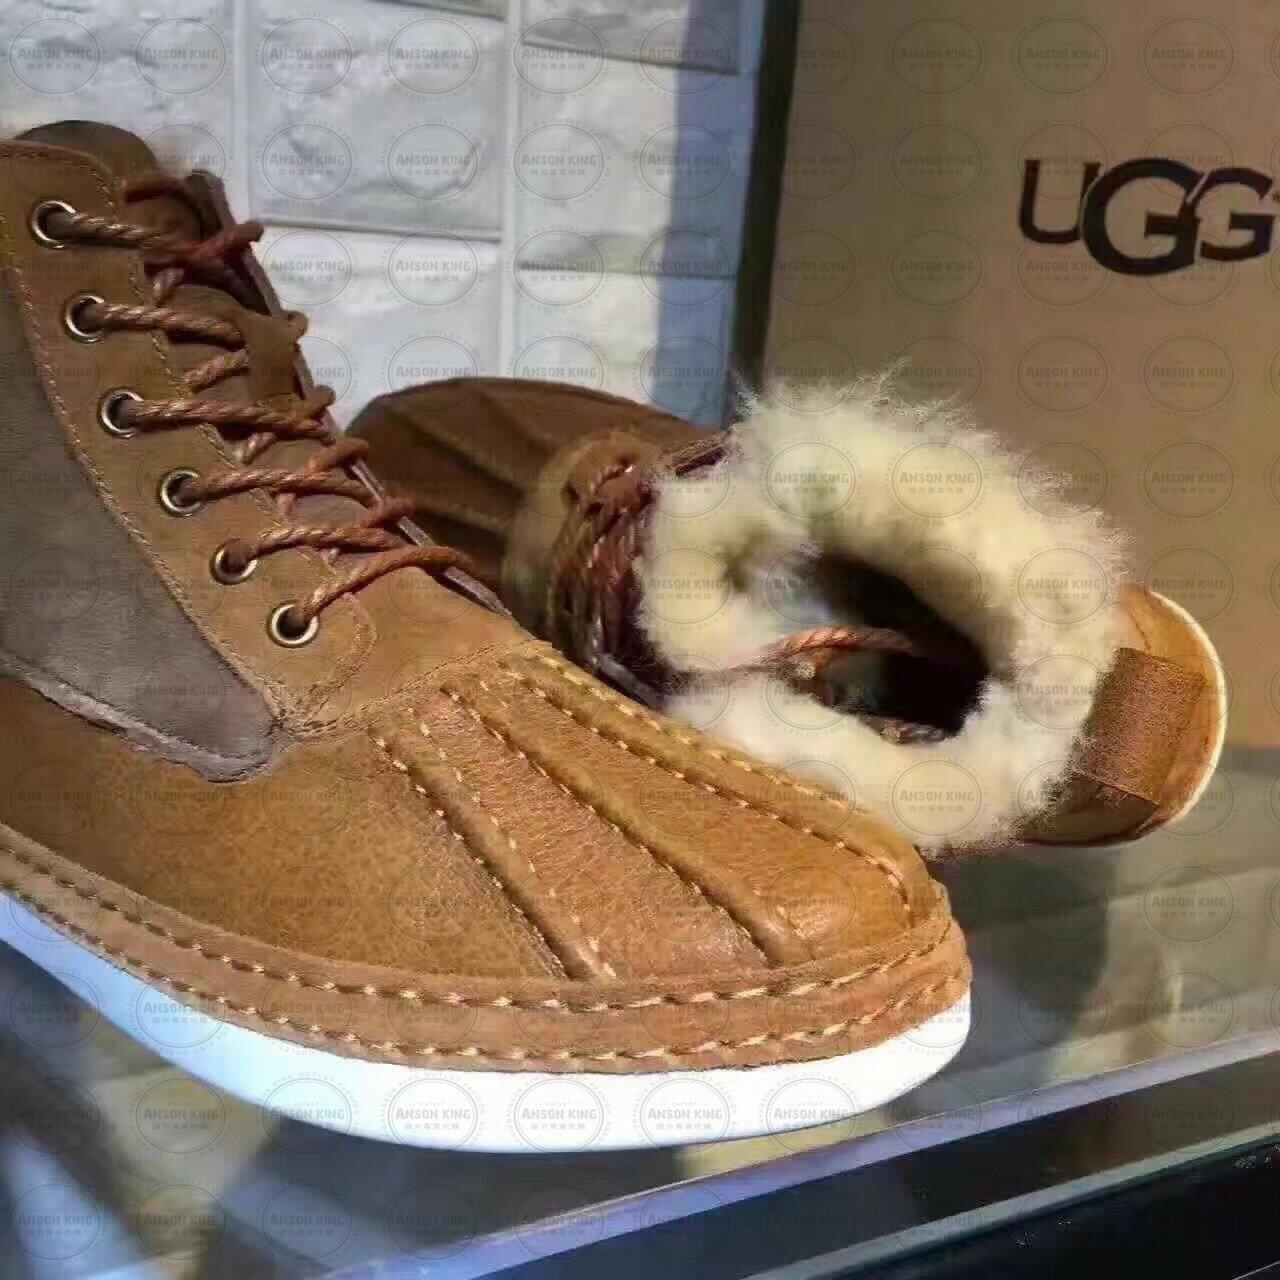 OUTLET正品代購 澳洲 UGG 冬季男款貝殼頭馬丁靴 短靴 保暖 真皮羊皮毛 雪靴 短靴 栗色 1